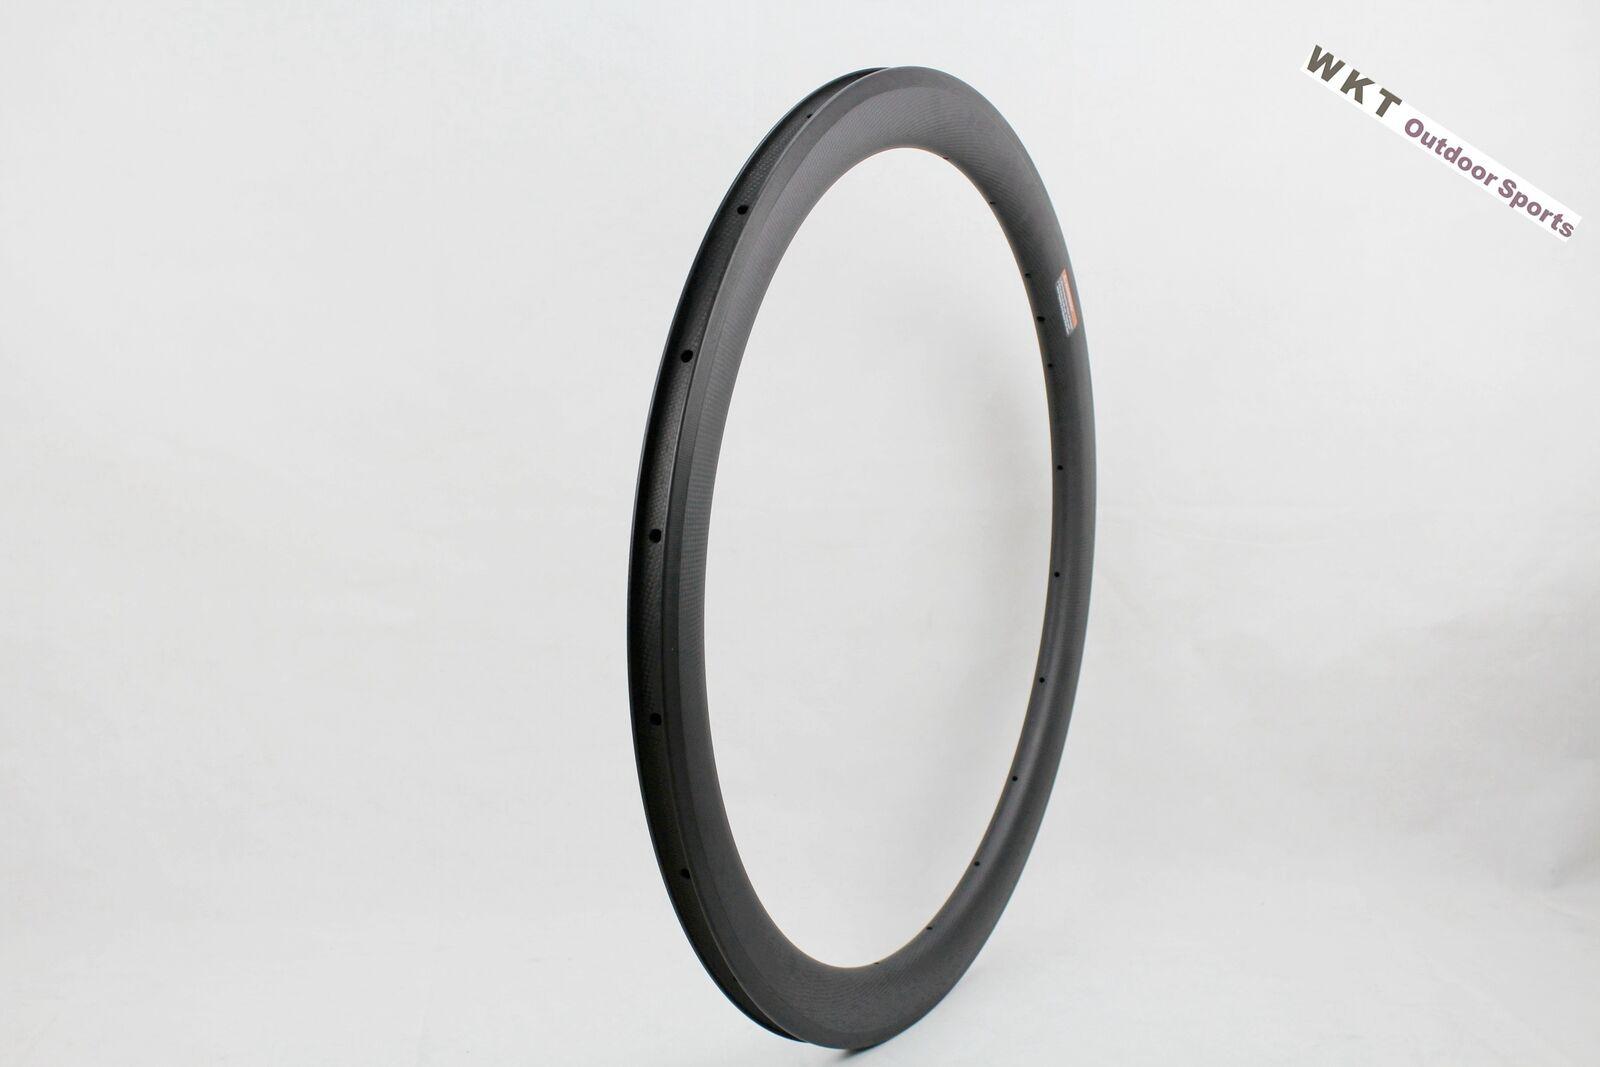 25mm Width 50mm Deepth Clincher Full Carbon 3K Rims Basalt Rim Brake Road Rims